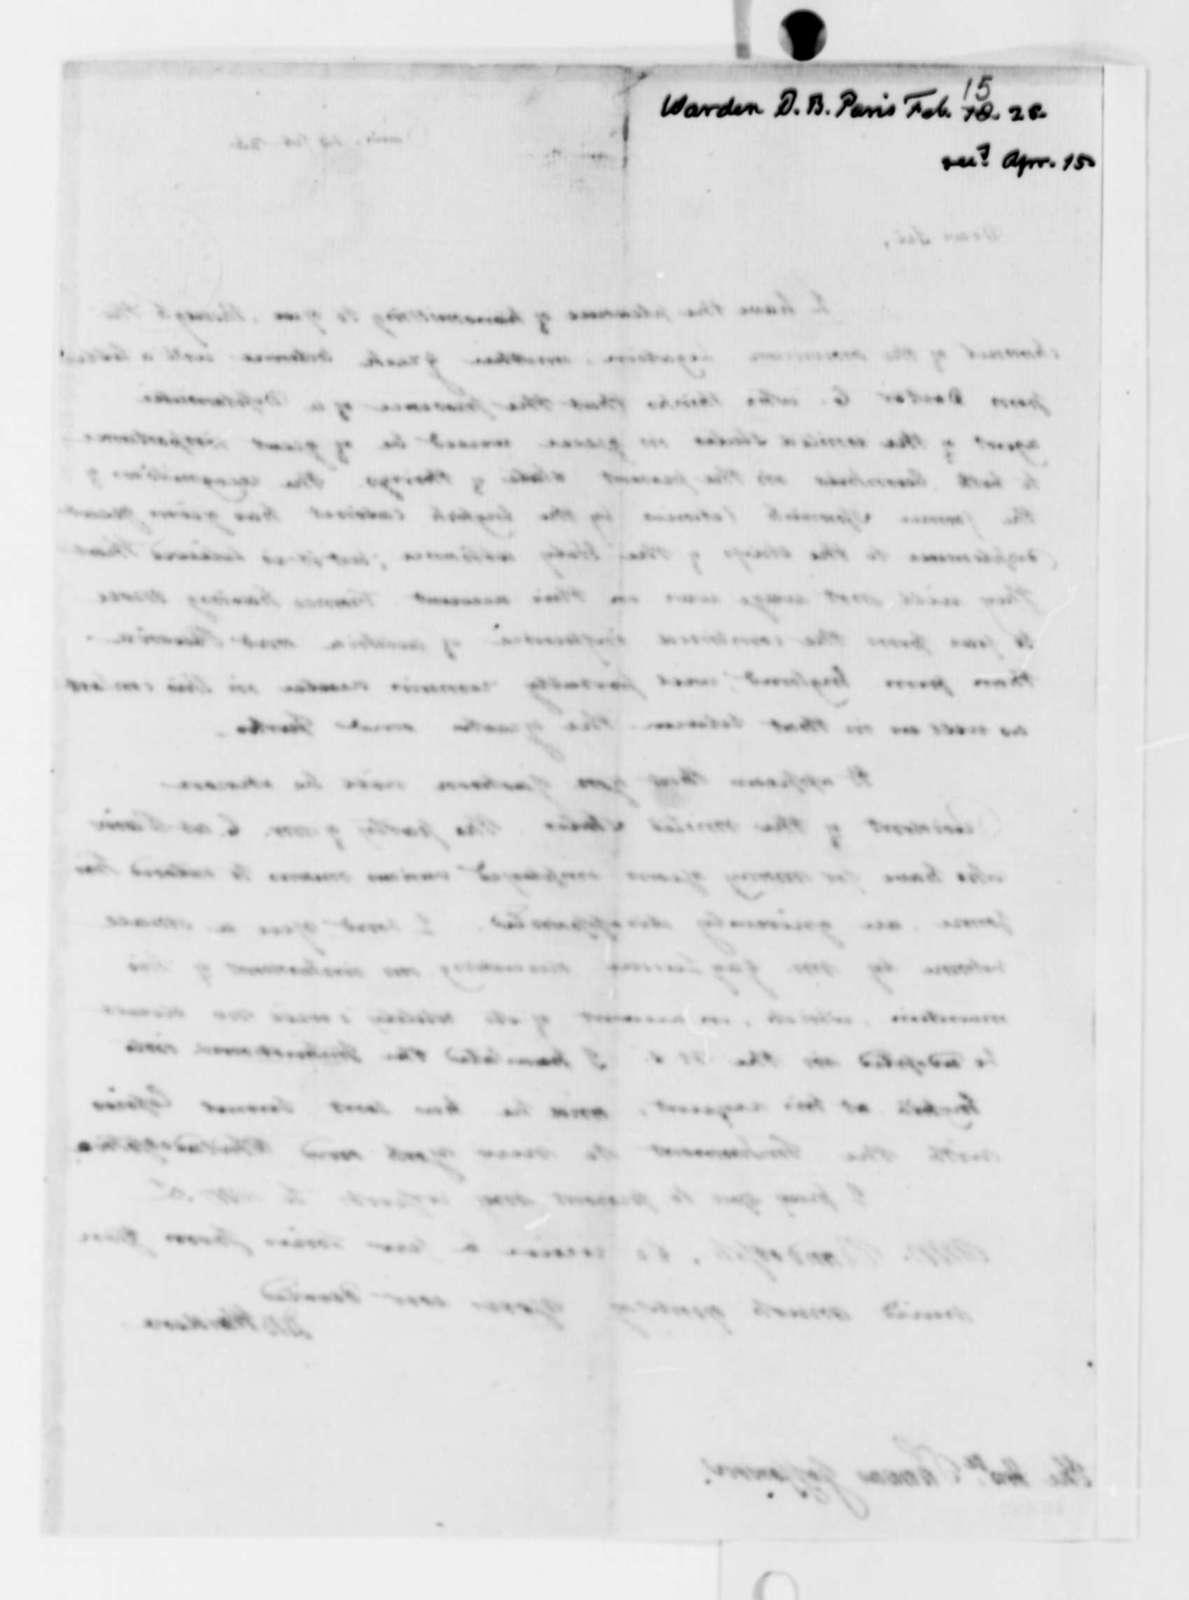 David B. Warden to Thomas Jefferson, February 15, 1825